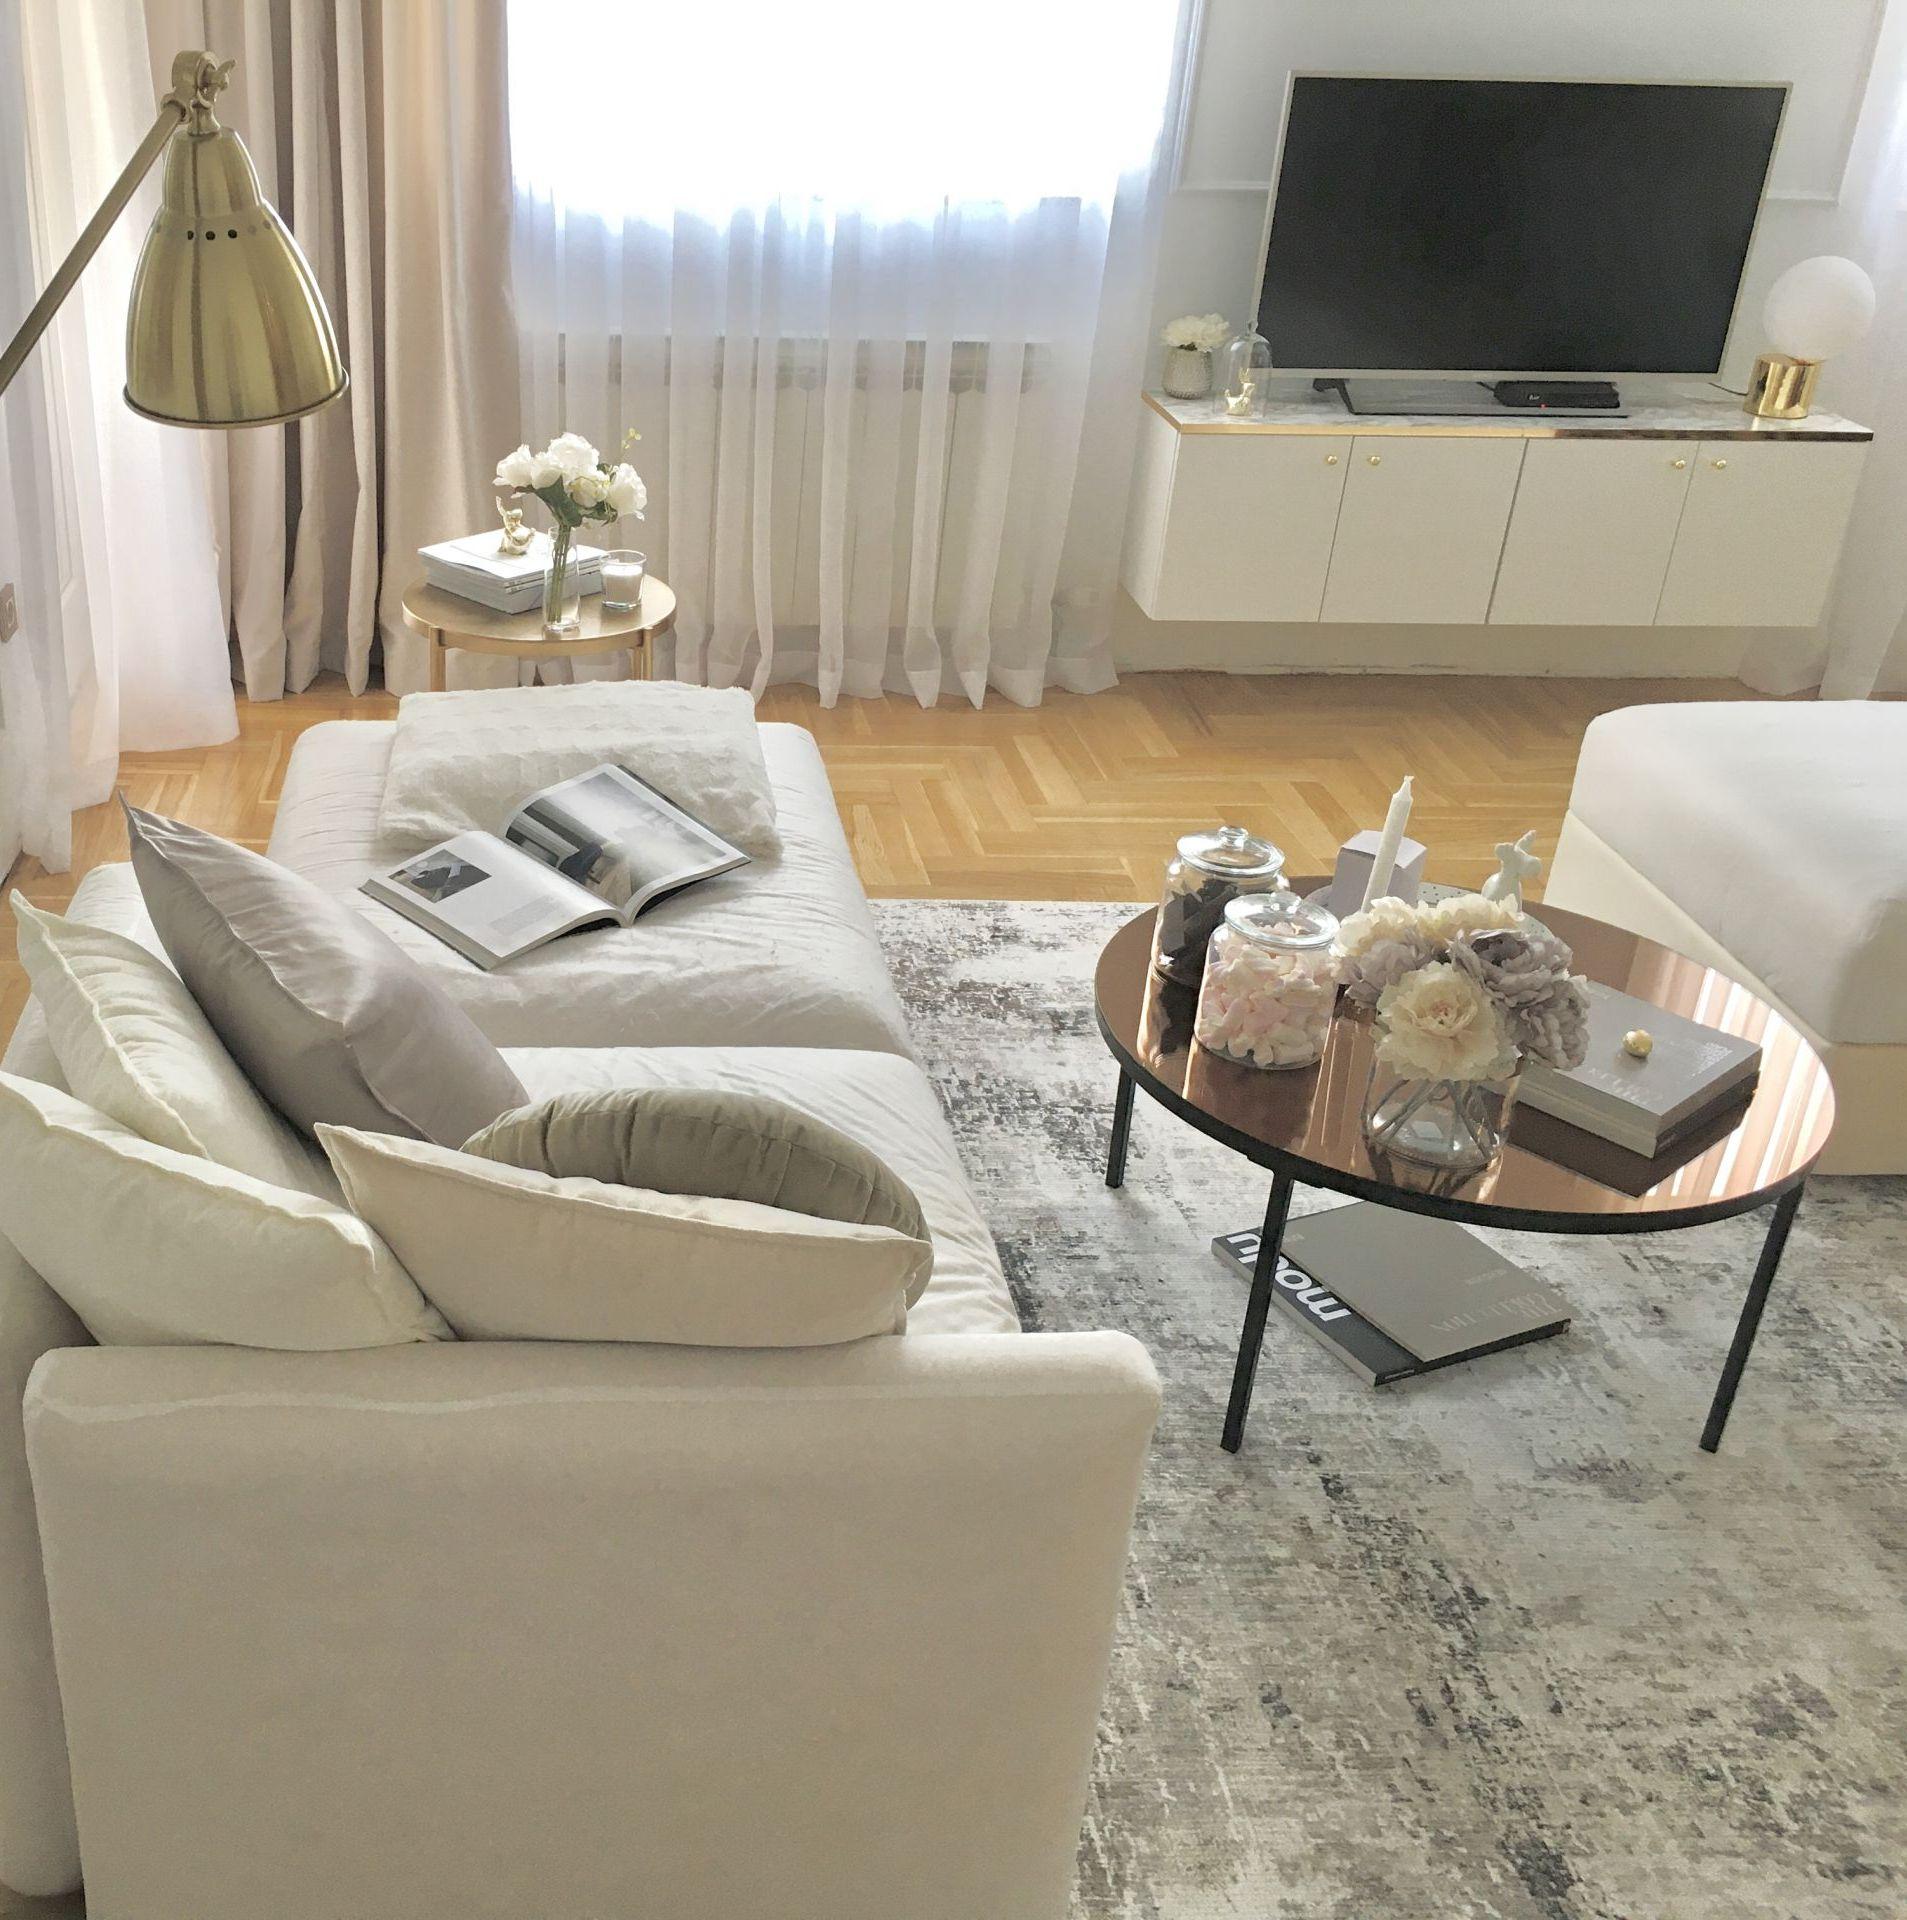 Iva-Celio-cega-makeover-dnevnog-boravka-18-scaled-e1578496287661